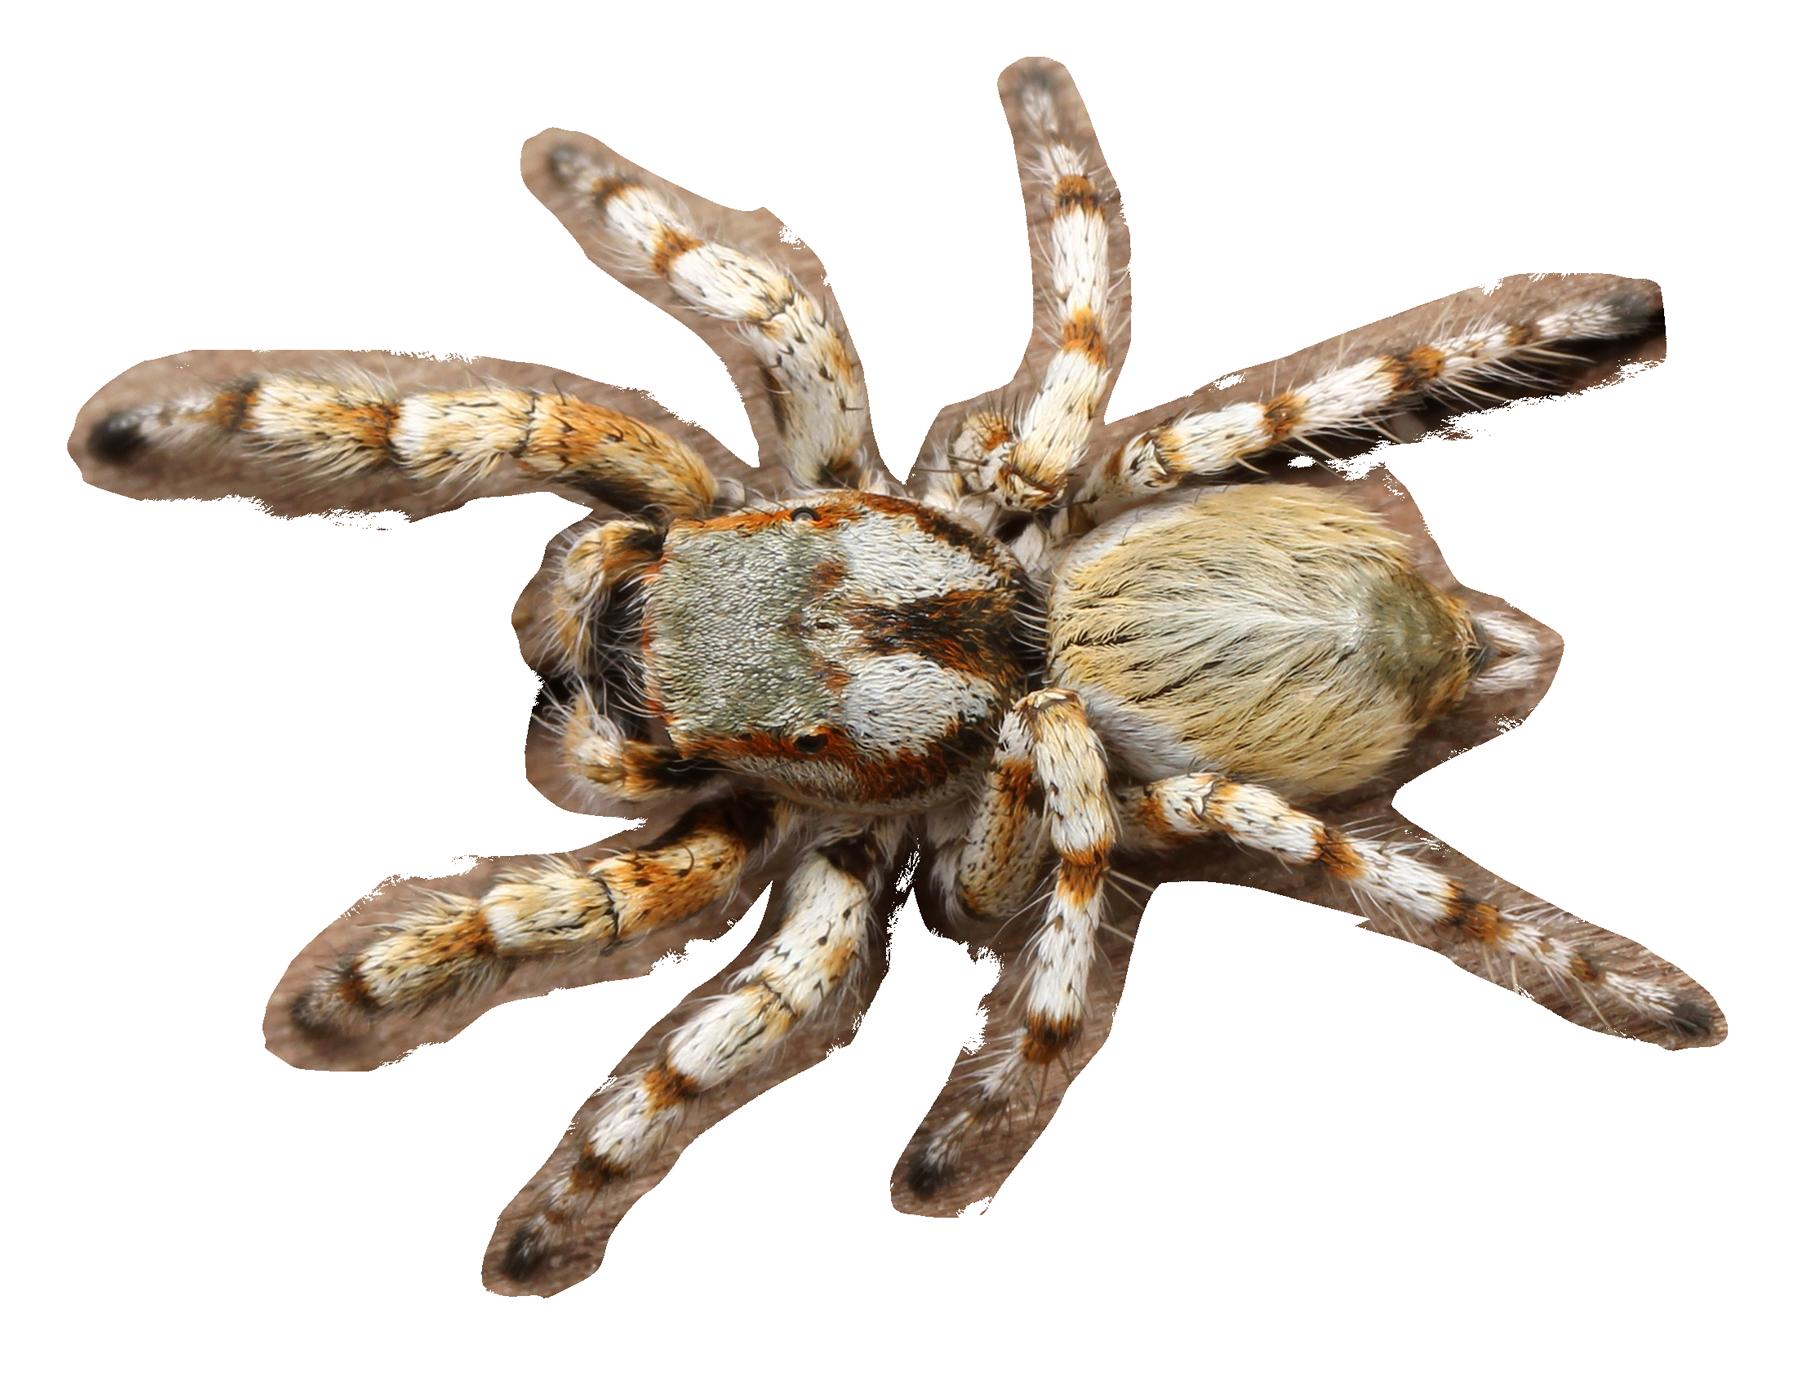 Spider PNG Image